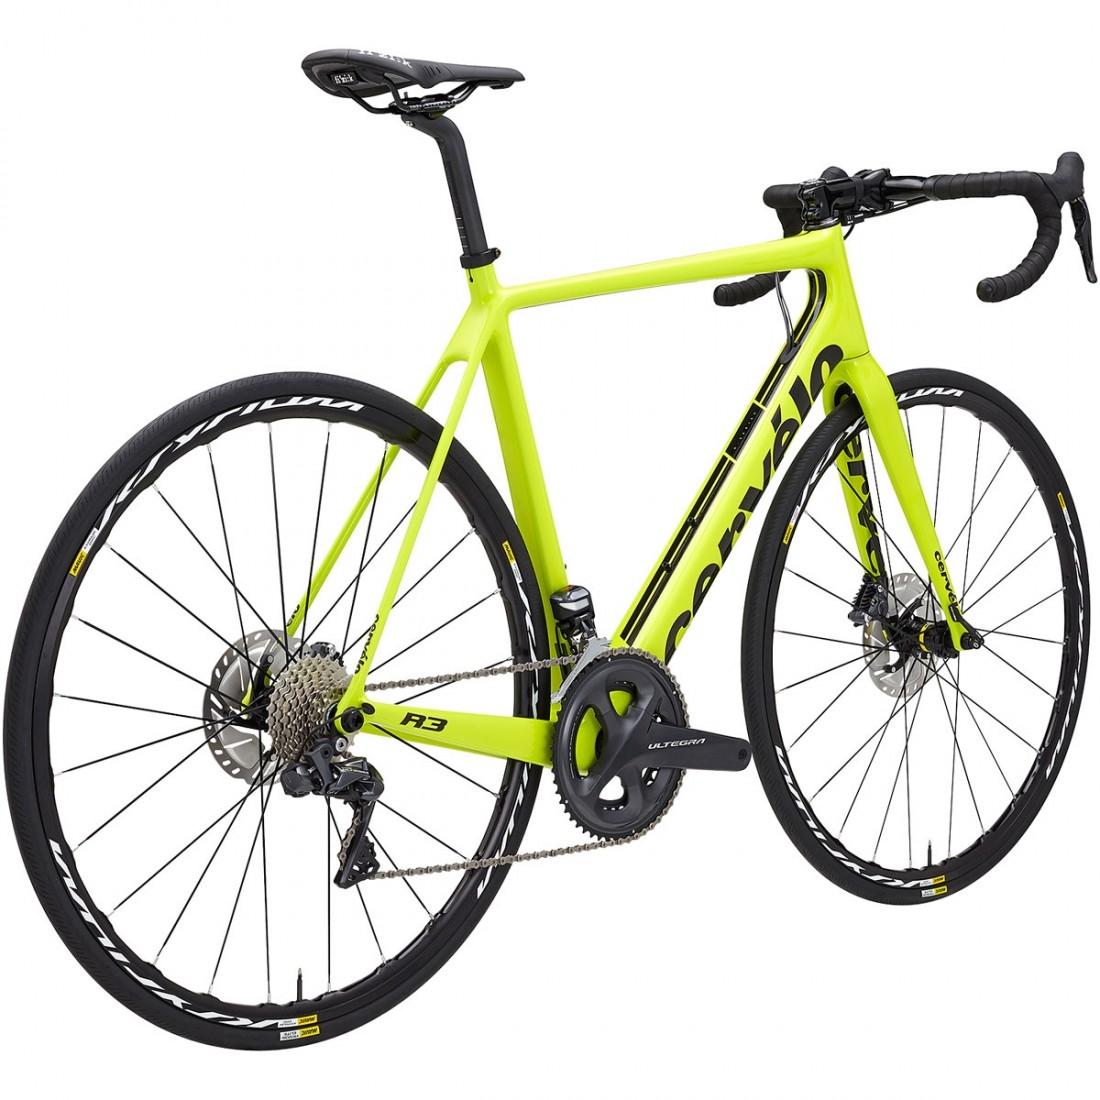 b1c2abf3d CERVELO R3 Disc Ultegra Di2 2018 Fluoro   Black Road bike · Motocard